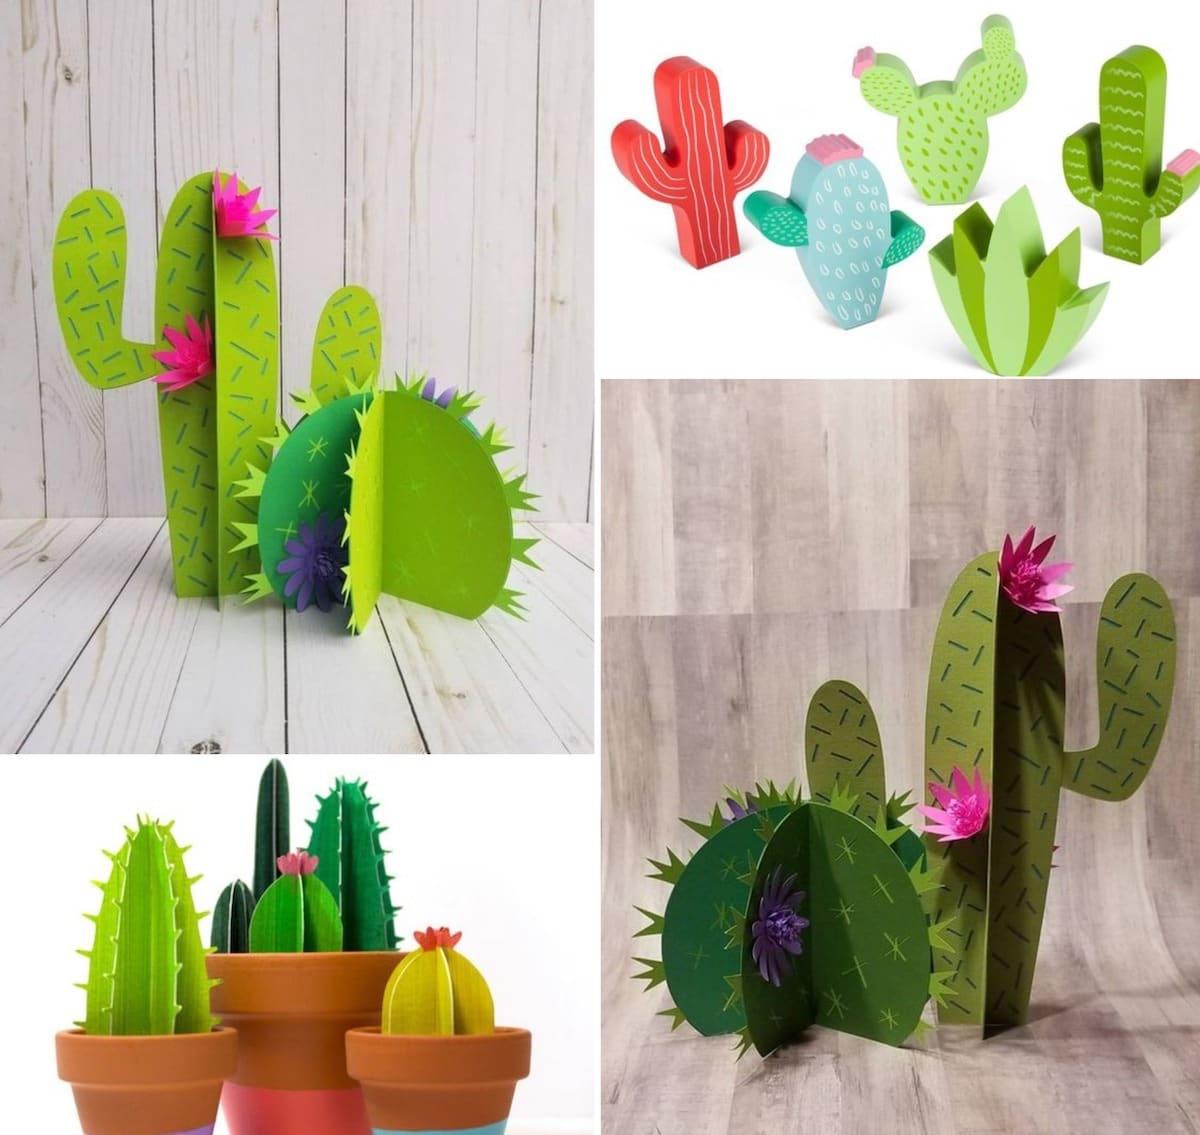 Забавные разноцветные кактусы